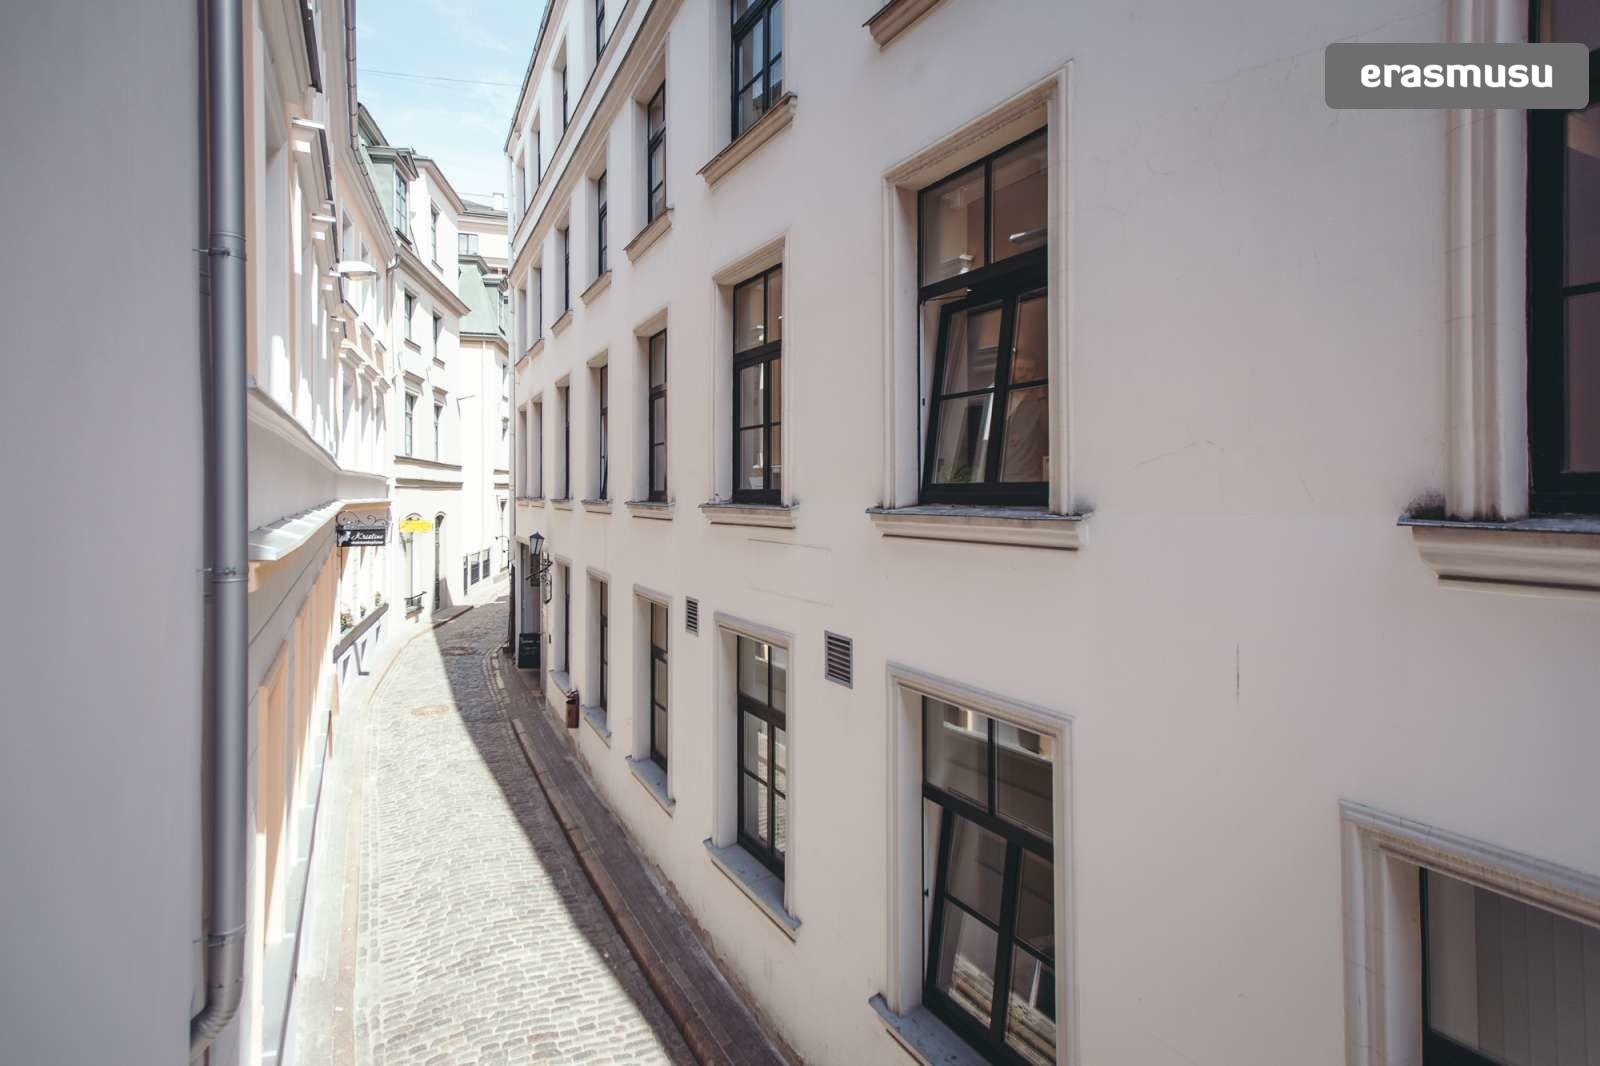 stylish-studio-apartment-rent-vecriga-4fa002451bba3bfa3ded89dc93